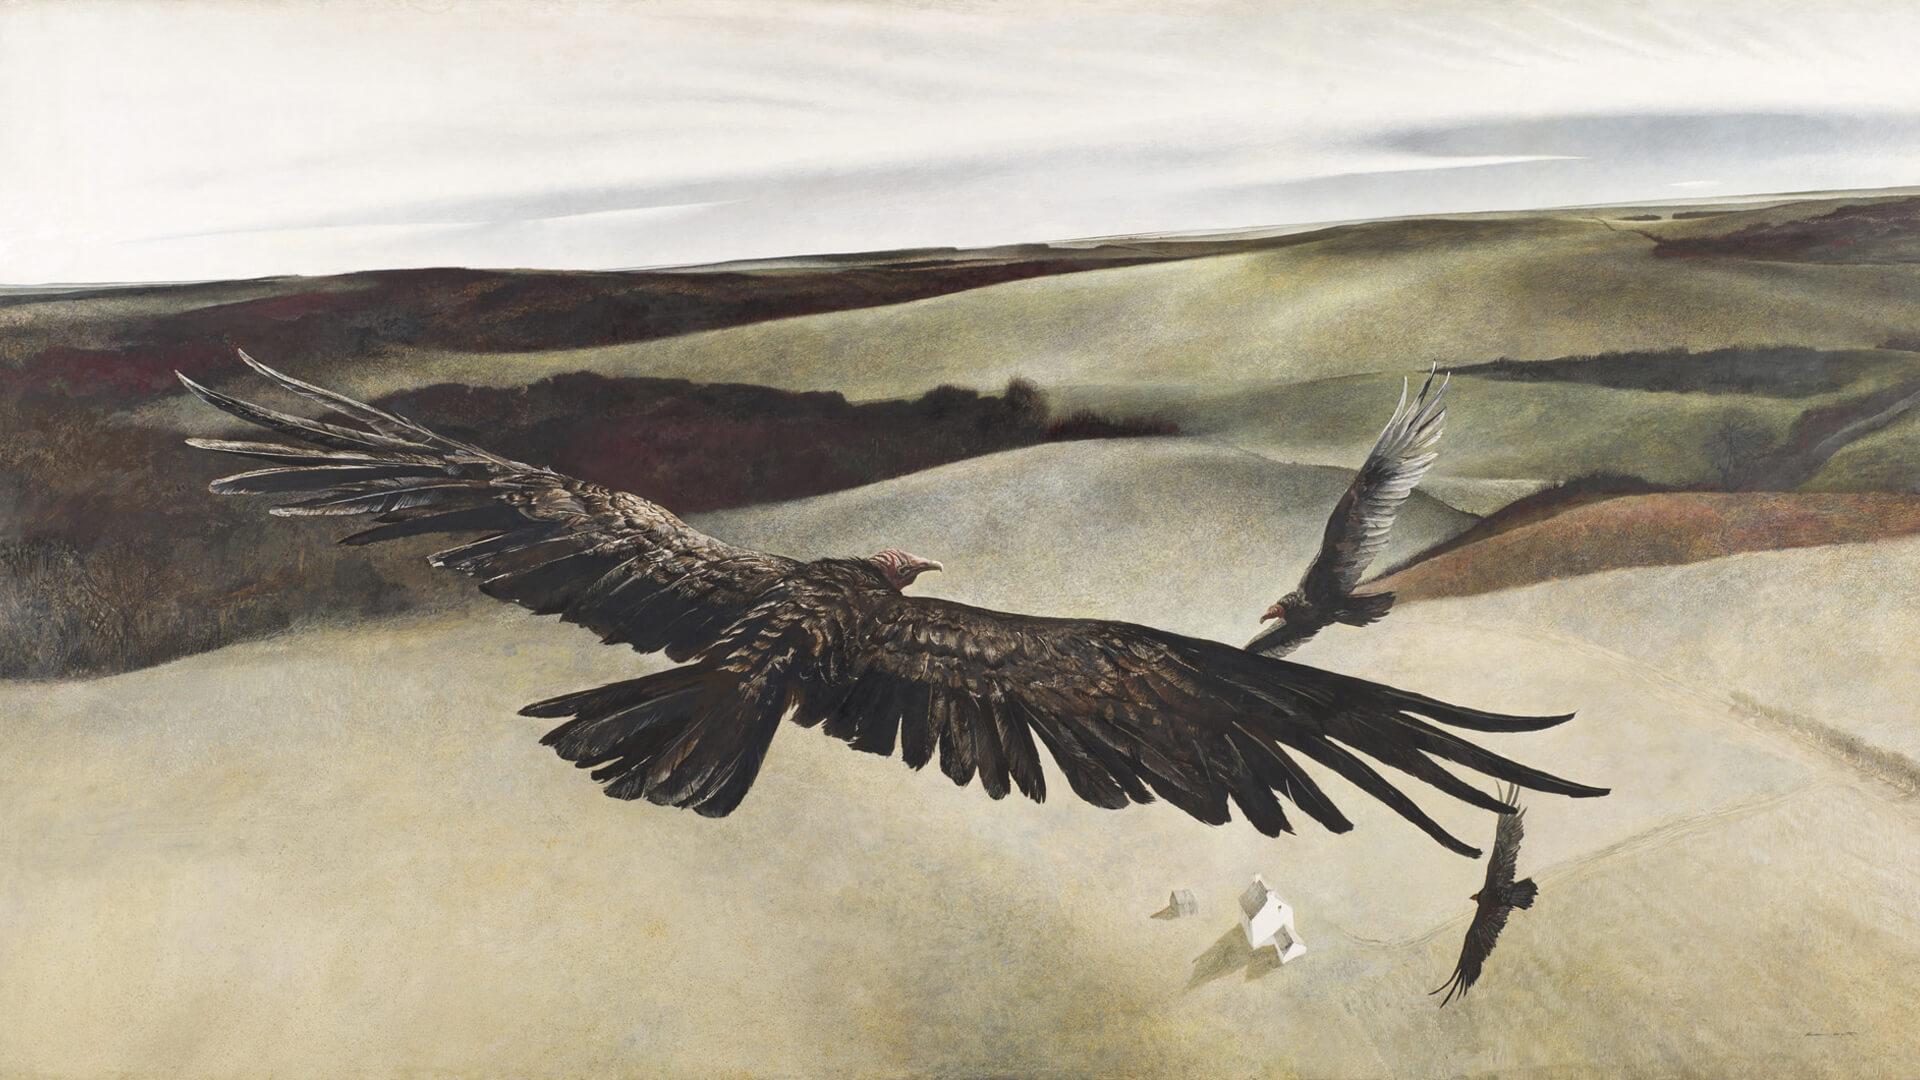 Andrew Wyeth-soaring_1920x1080